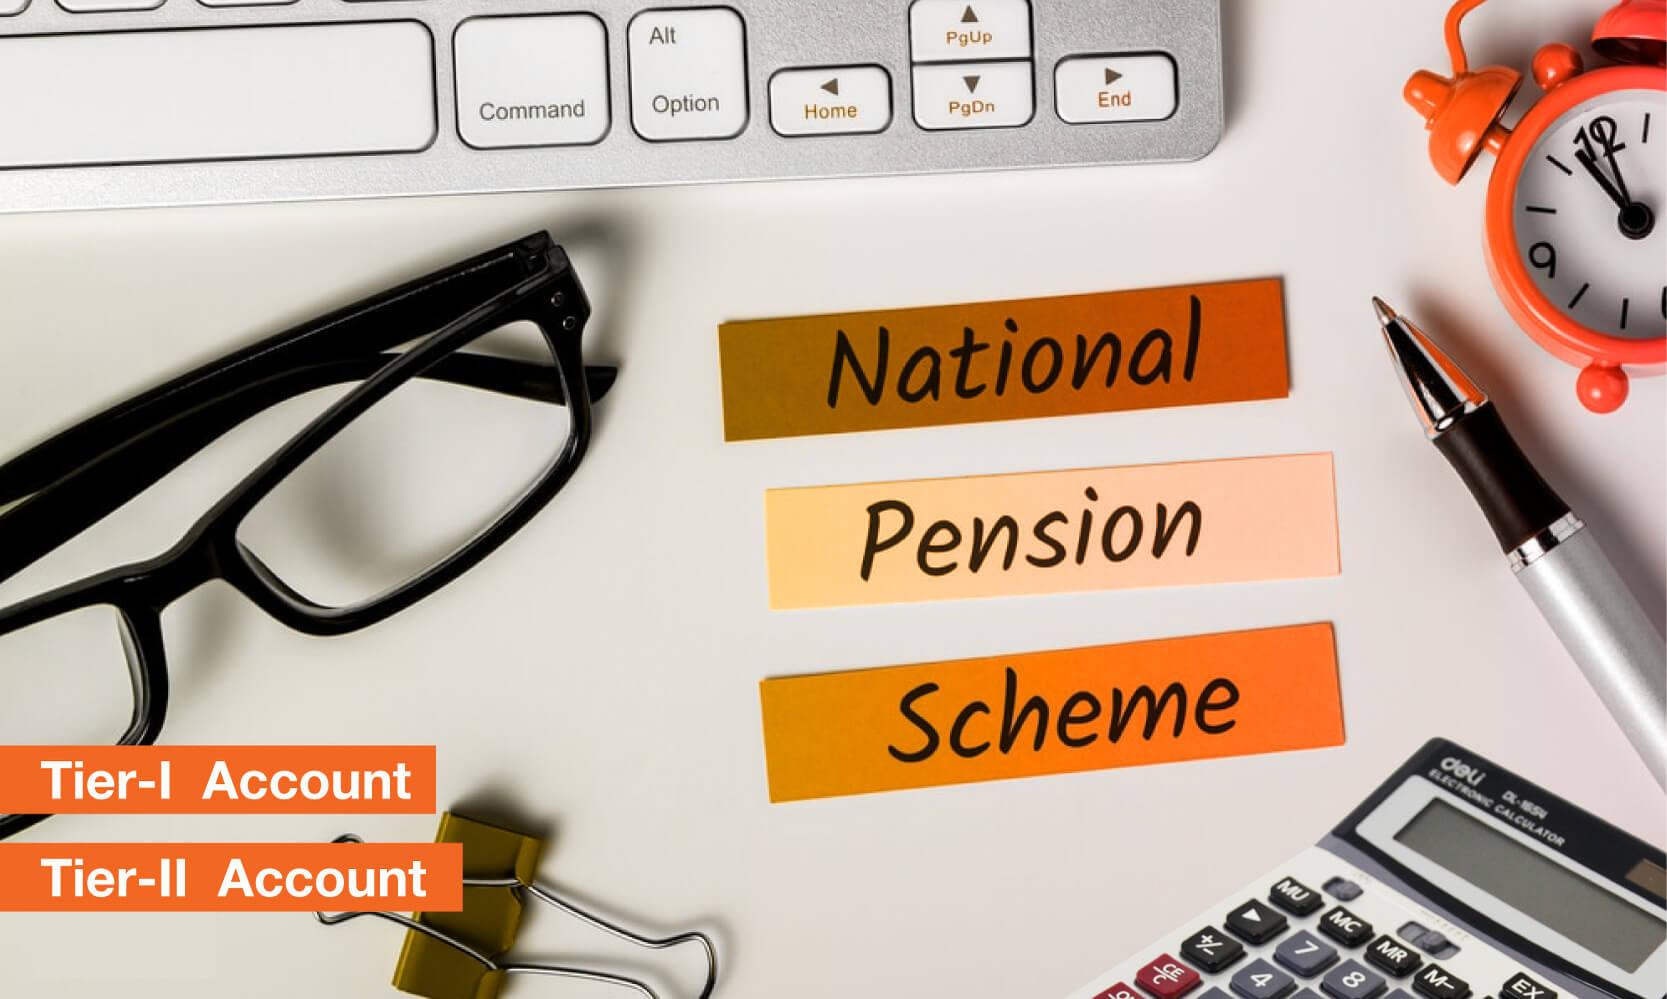 National Pension Scheme System